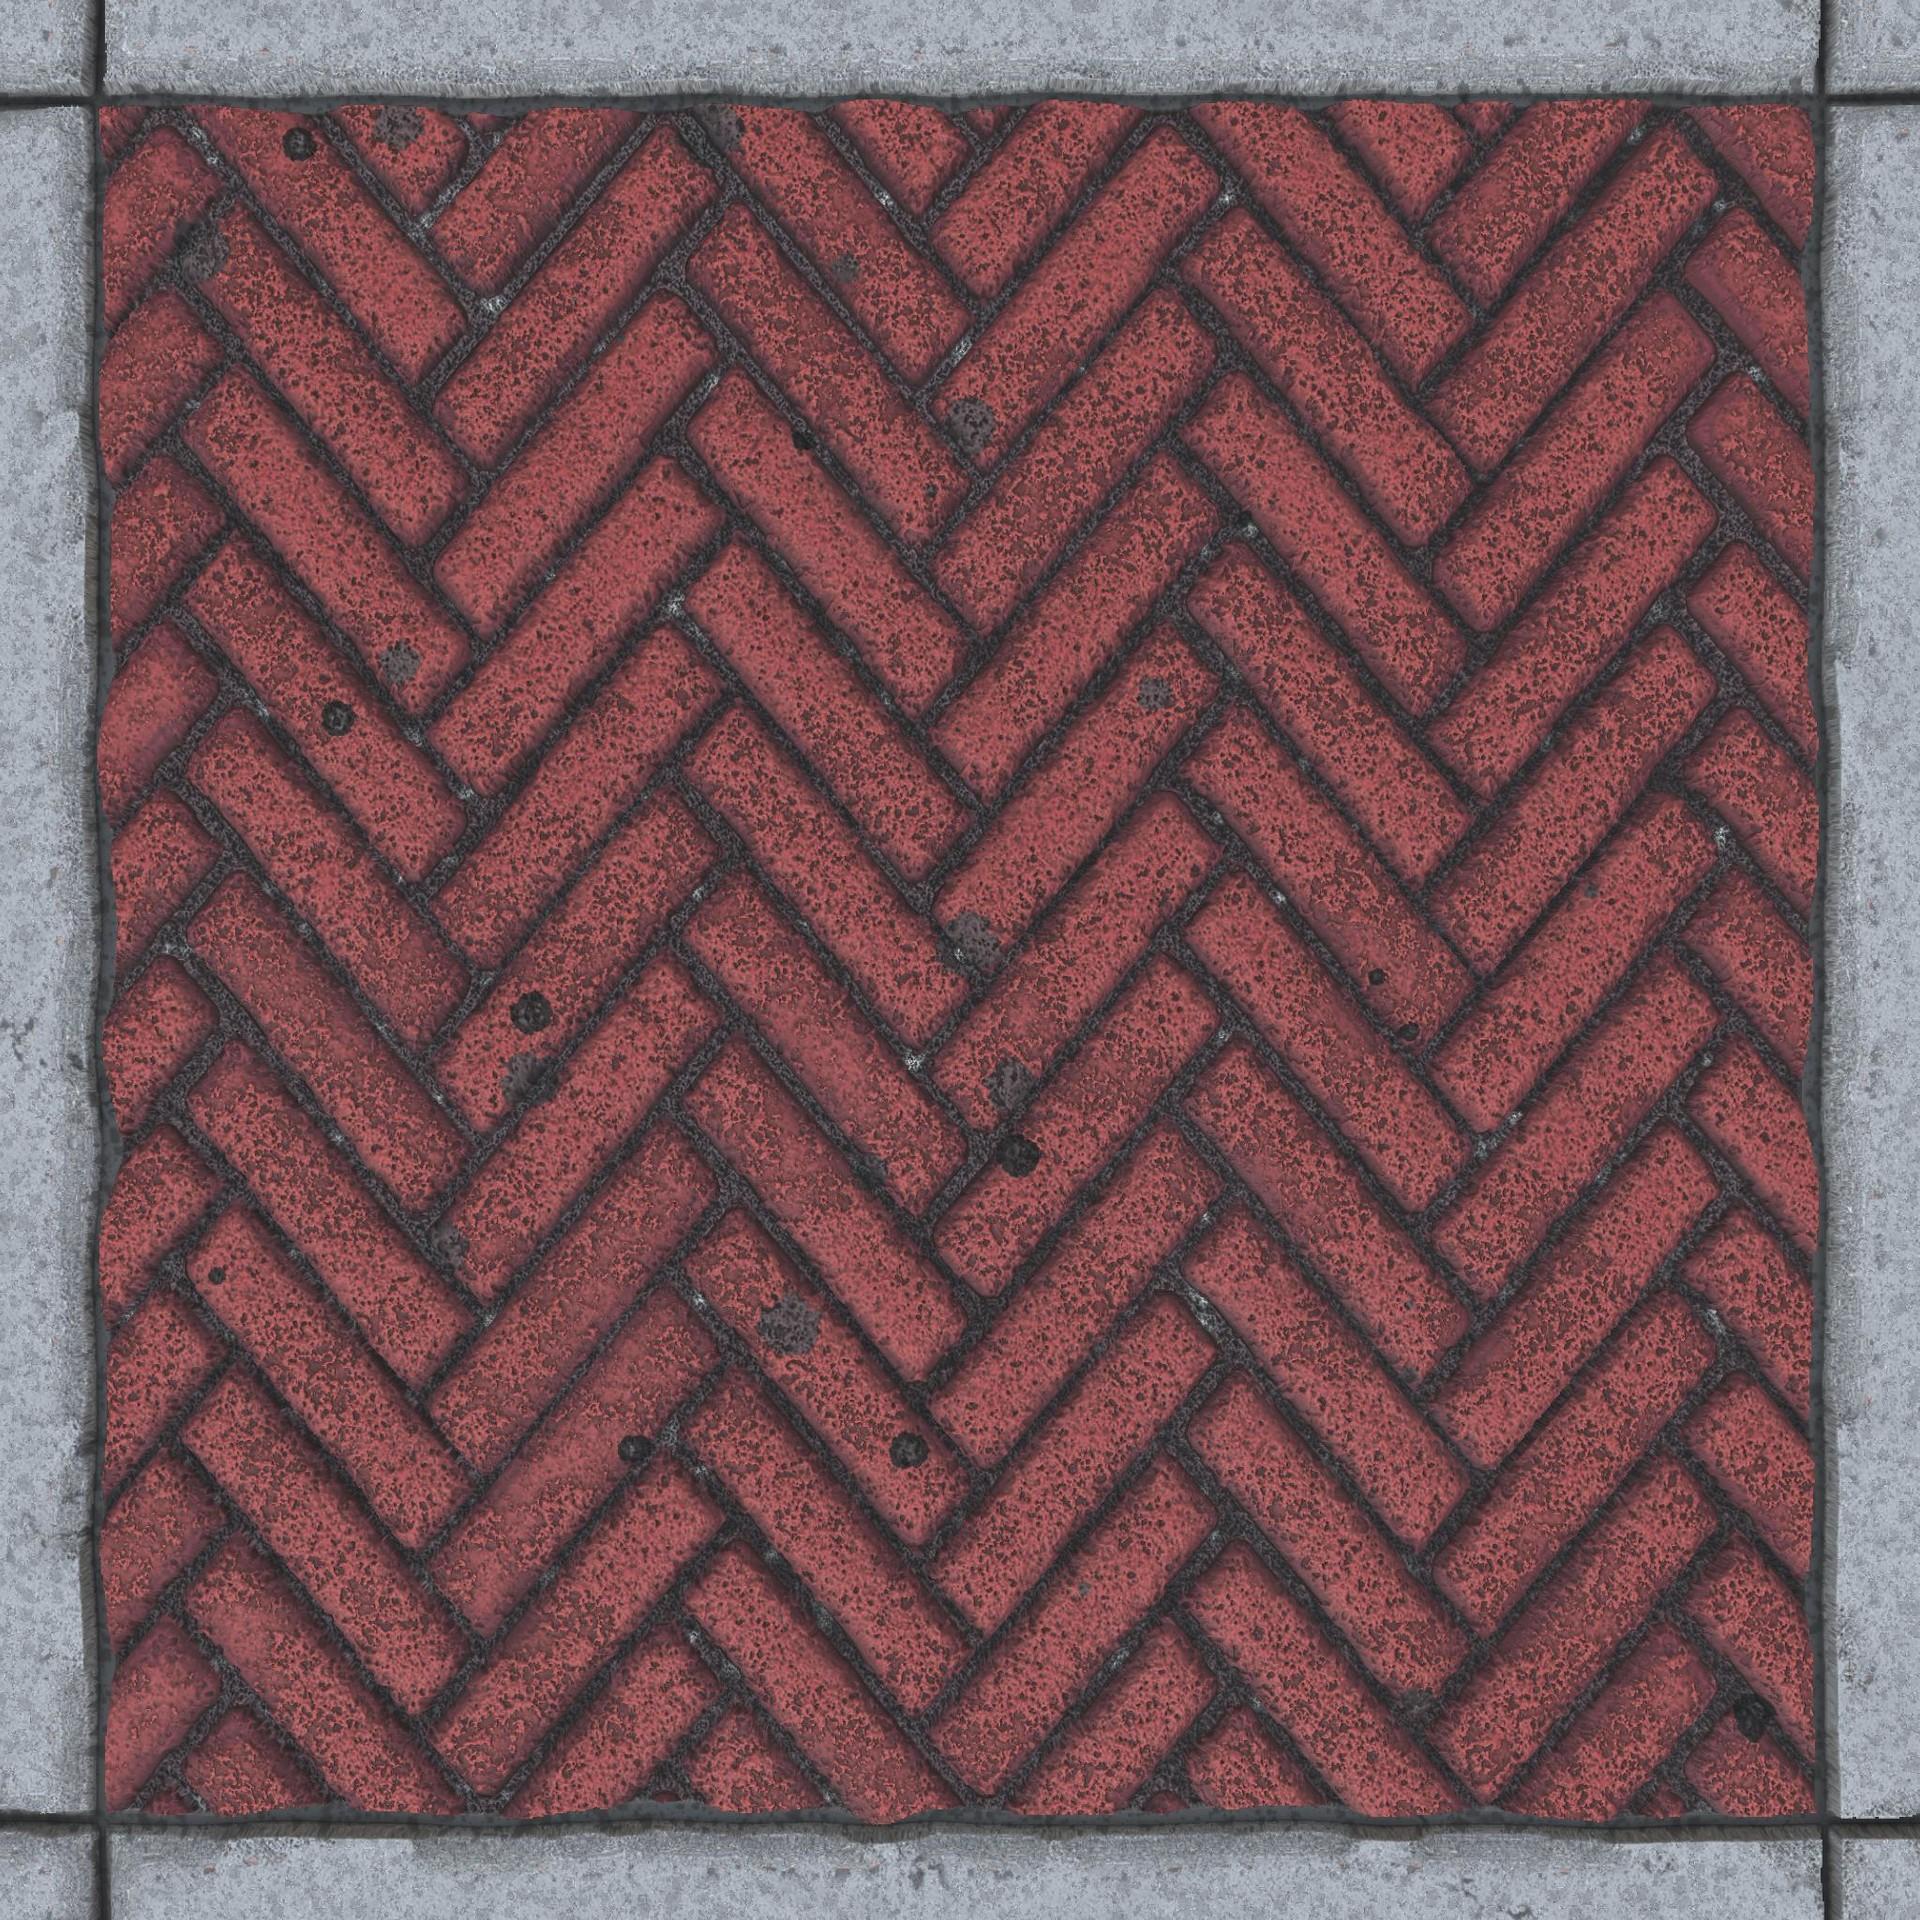 James ray sidewalk 4